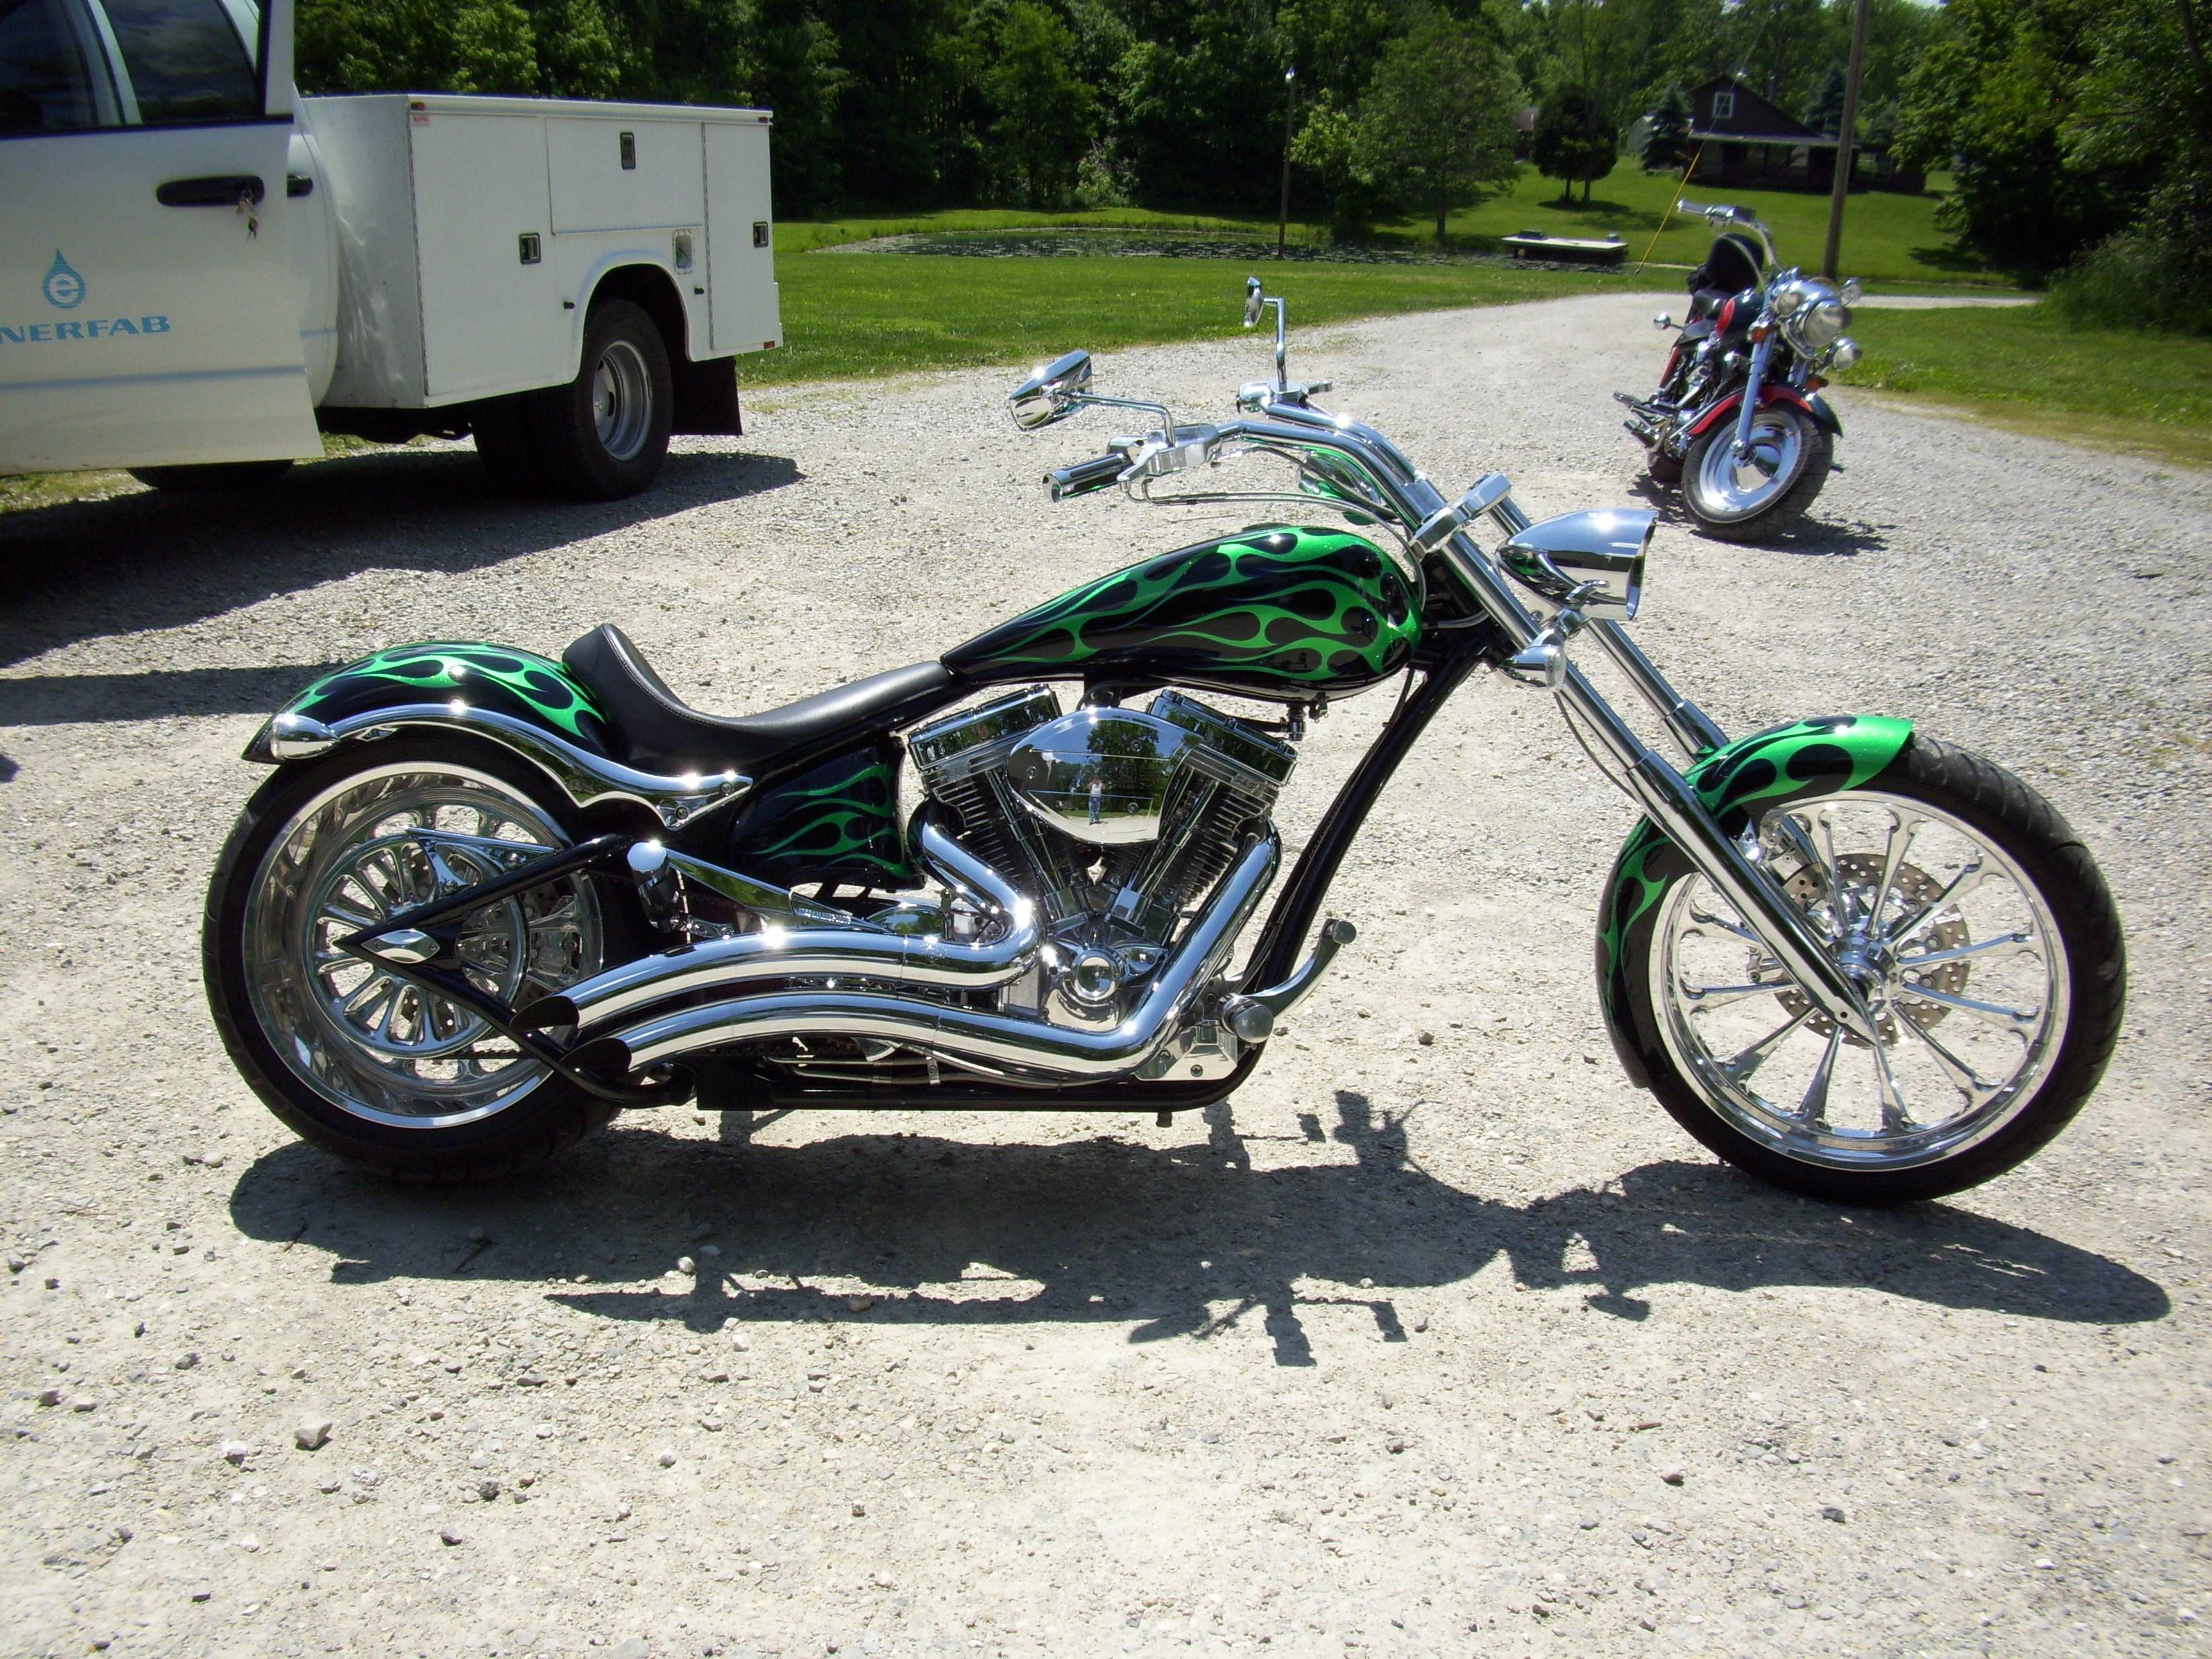 craigslist syracuse motorcycles | Amatmotor.co